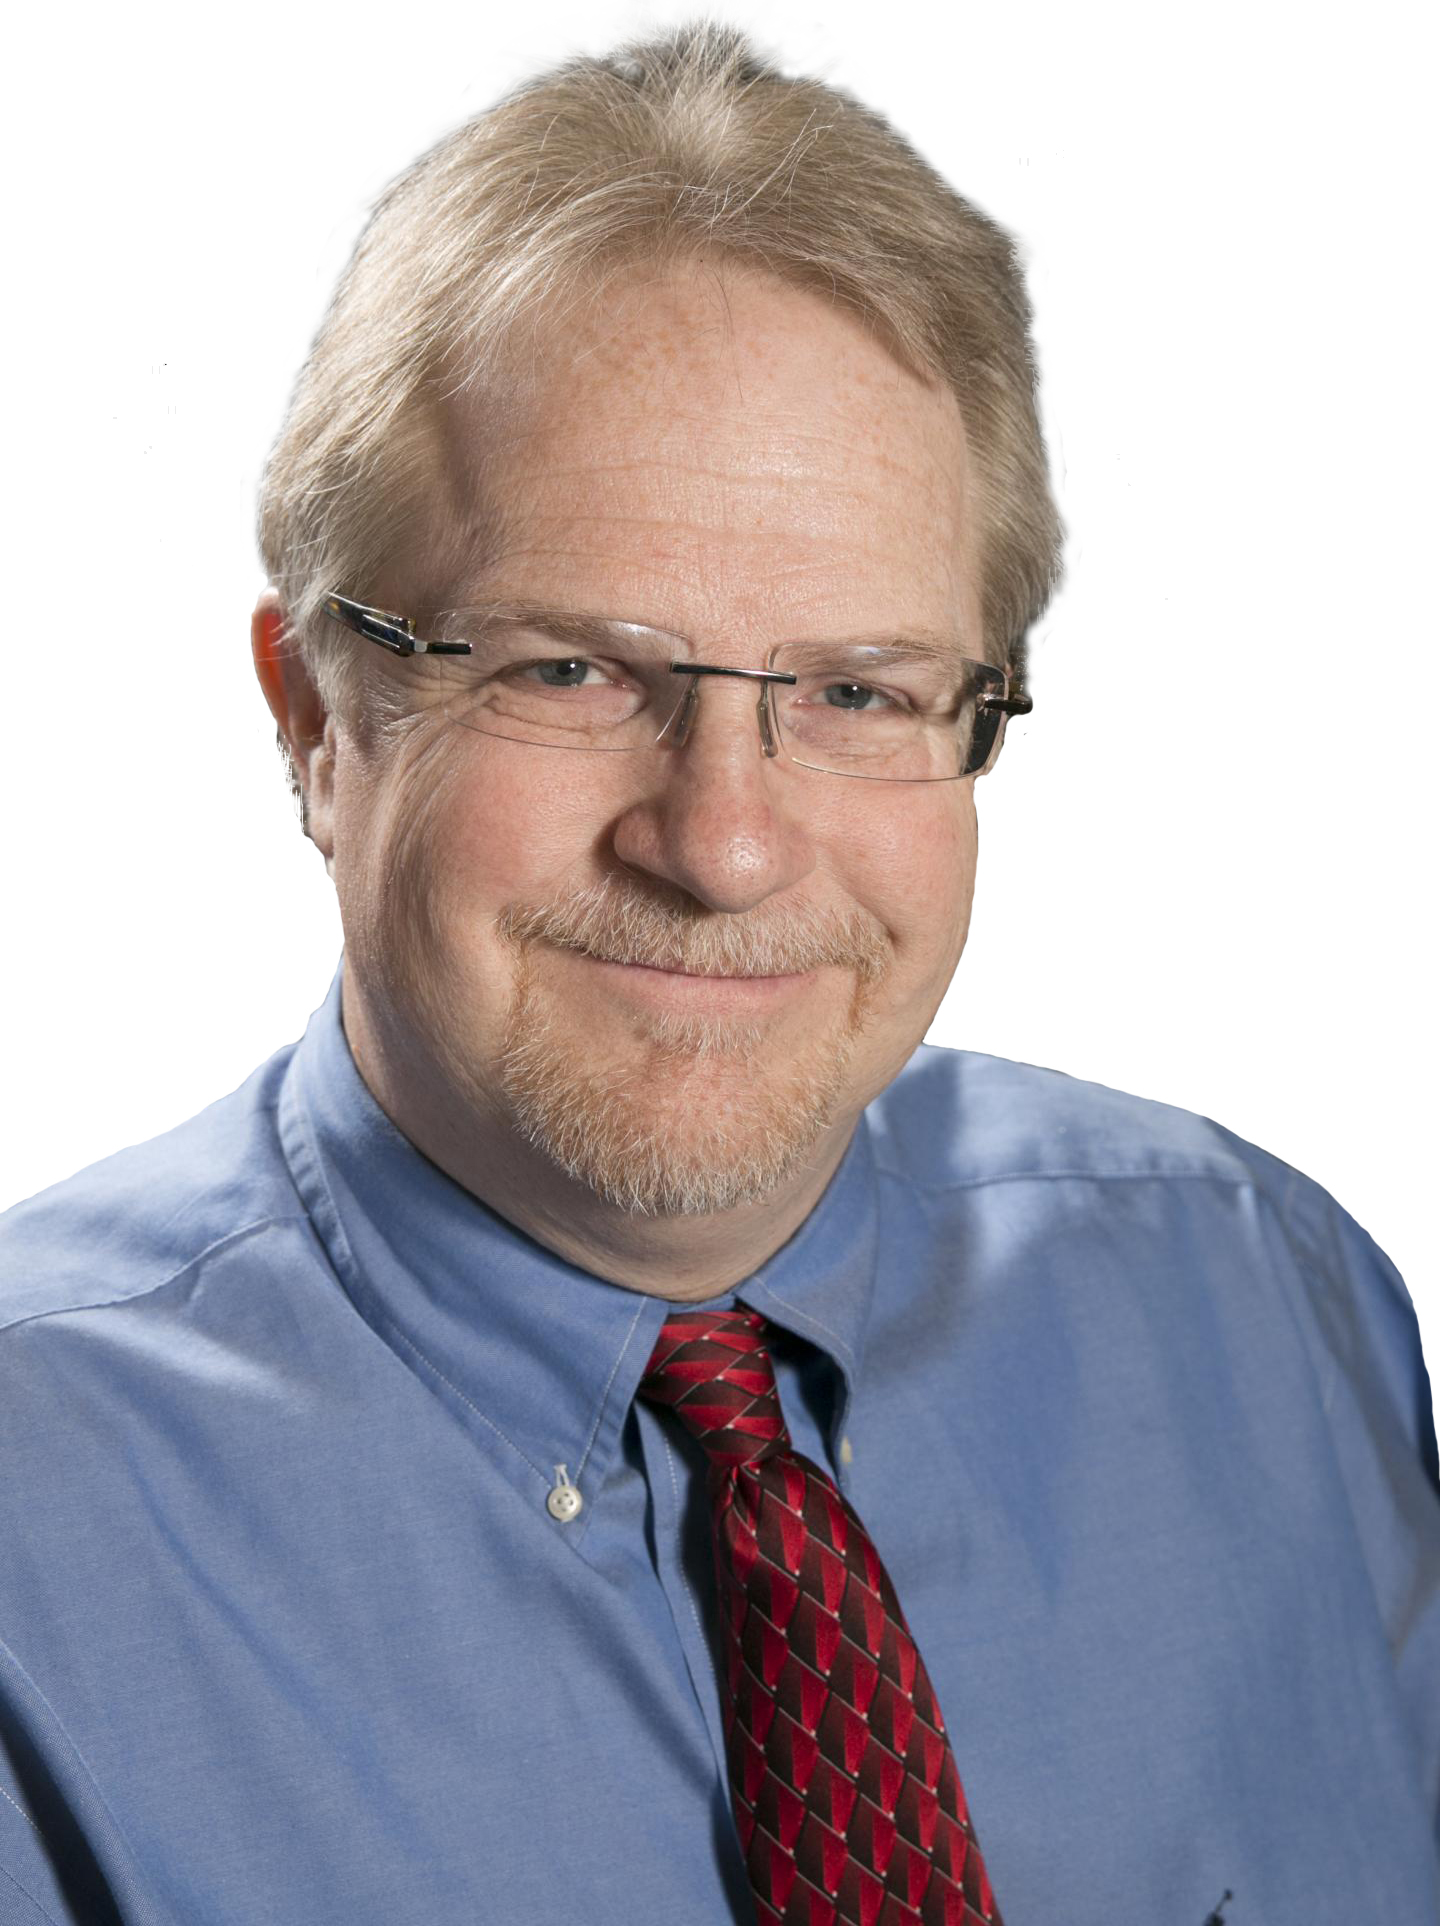 Dr. Trevor Dyson-Hudson